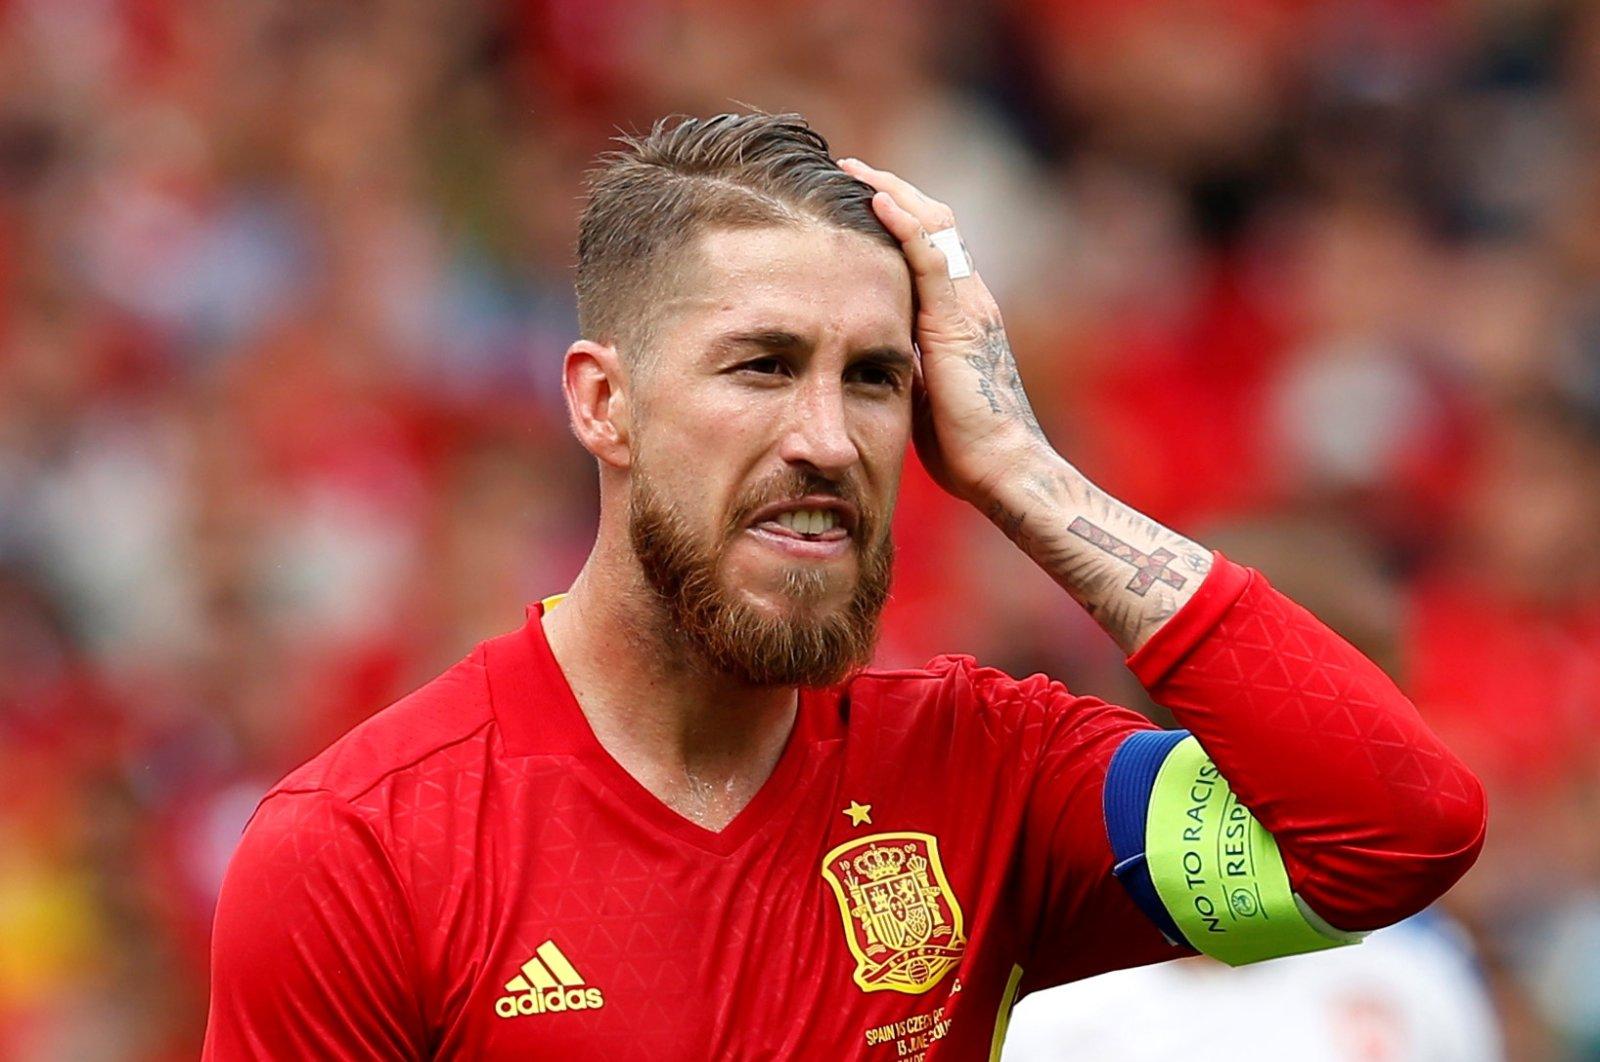 Spain's Sergio Ramos looks dejected during a EURO 2016 Group D match against Czech Republic, Stadium de Toulouse, Toulouse, France, June 13, 2016. (Reuters Photo)